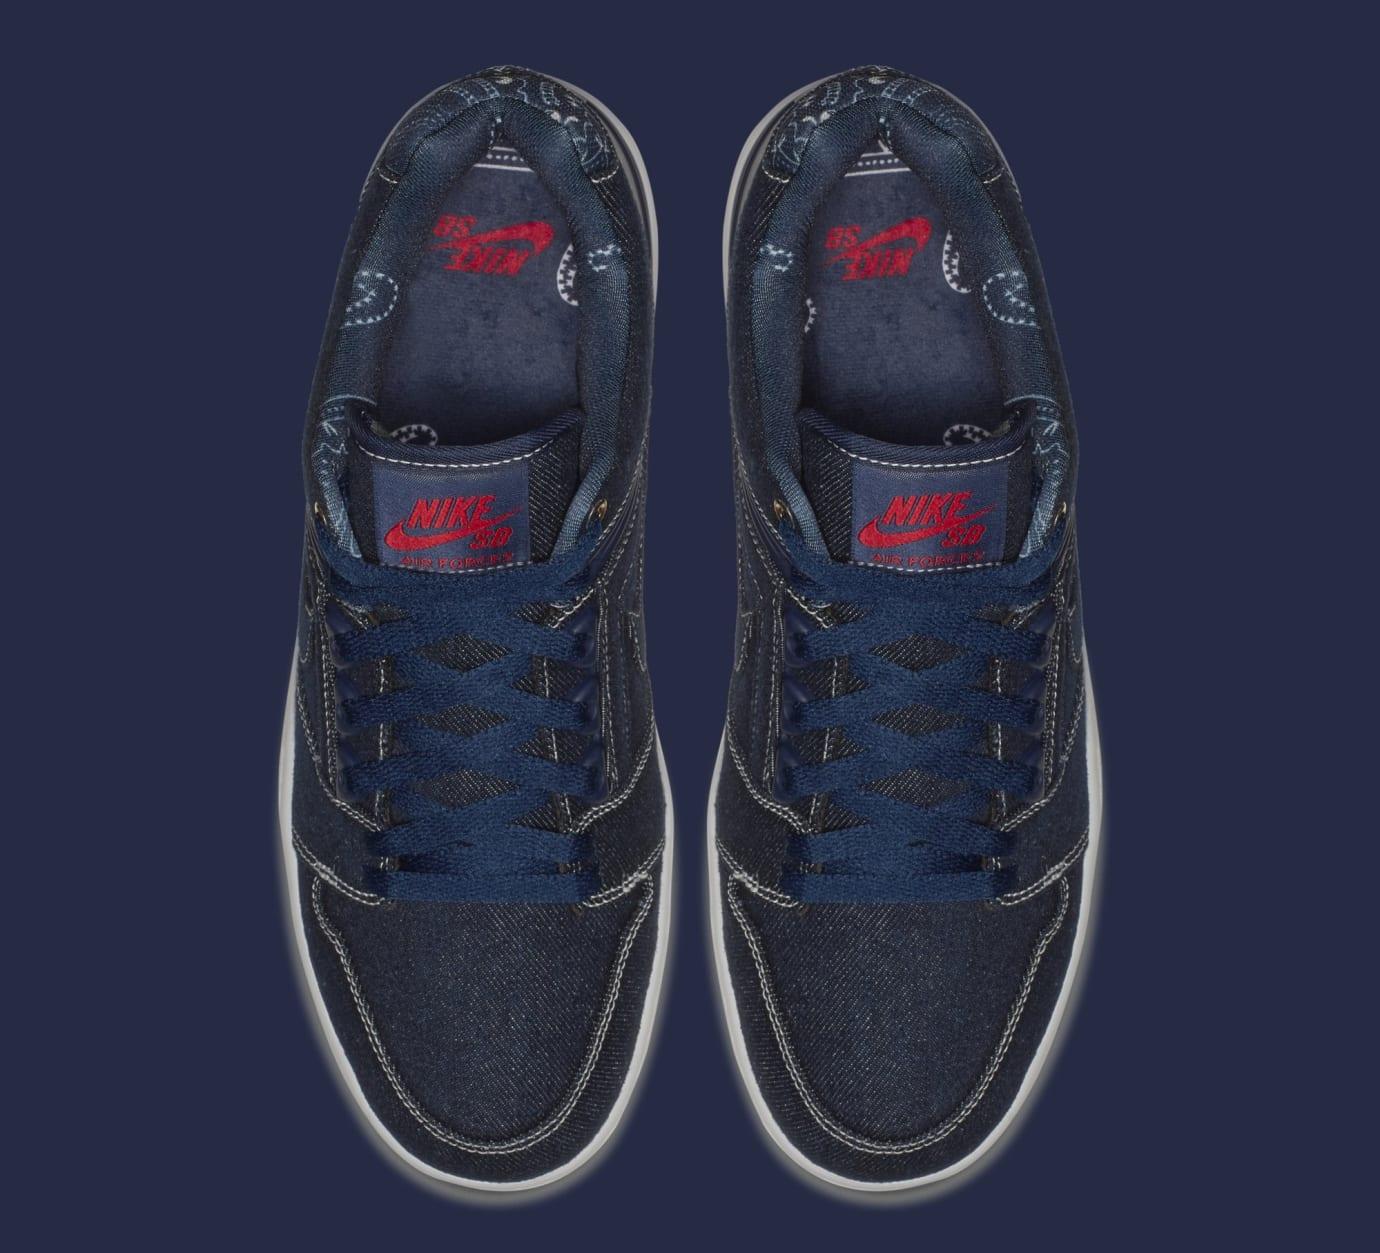 Nike SB Air Force 2 Low '2pac' AO0298-441 (Top)